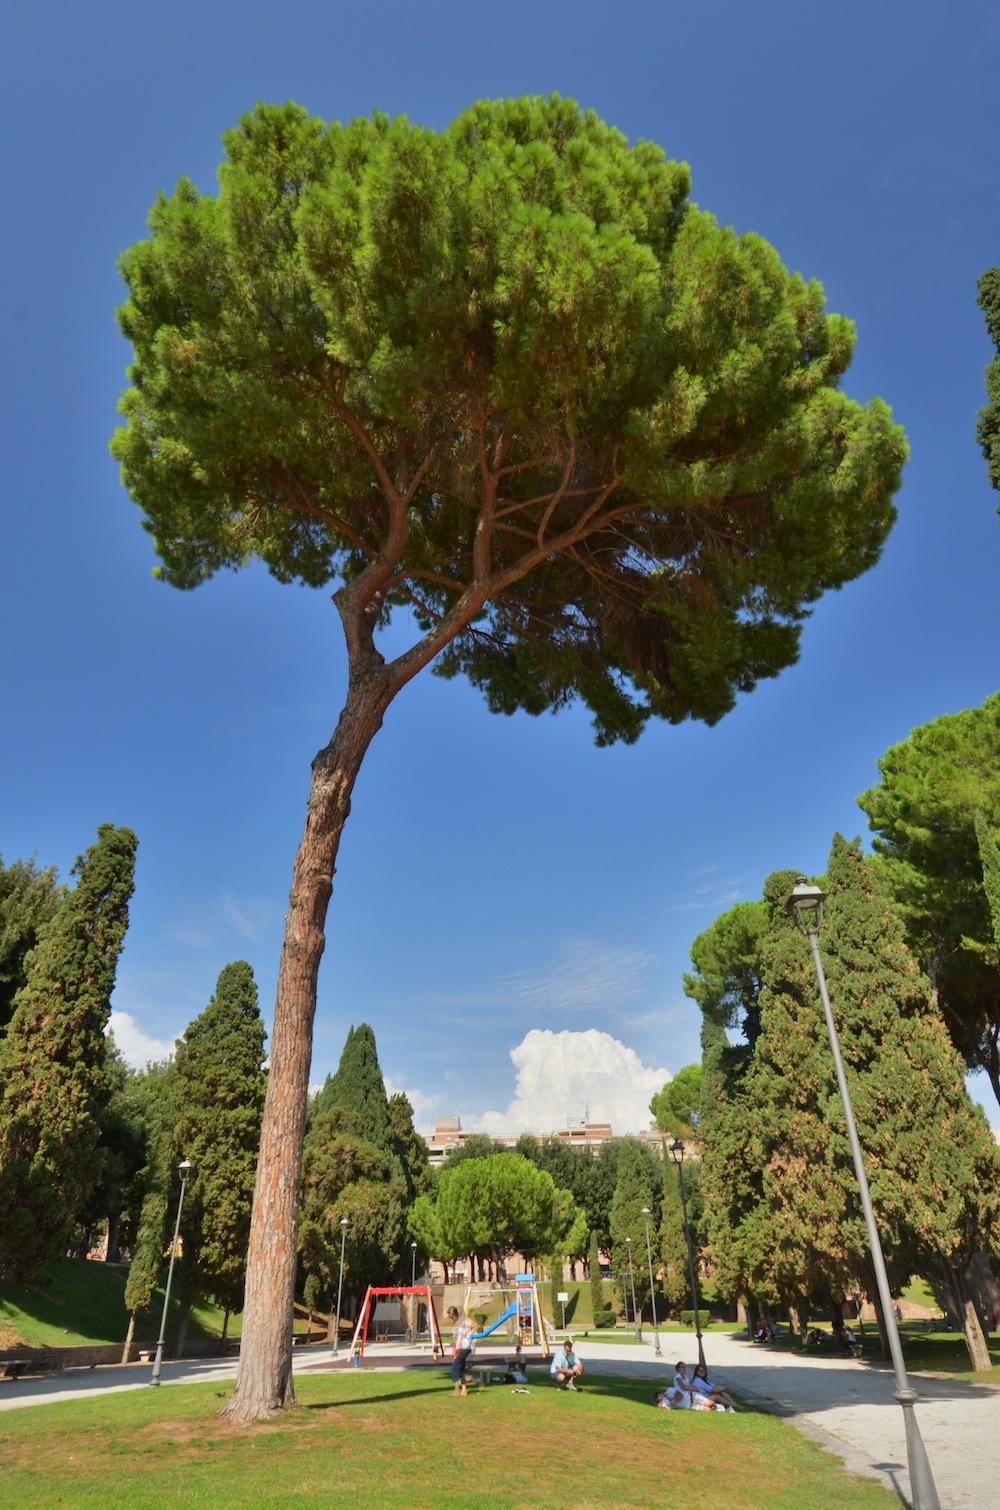 Pine tree in Rome, Italy